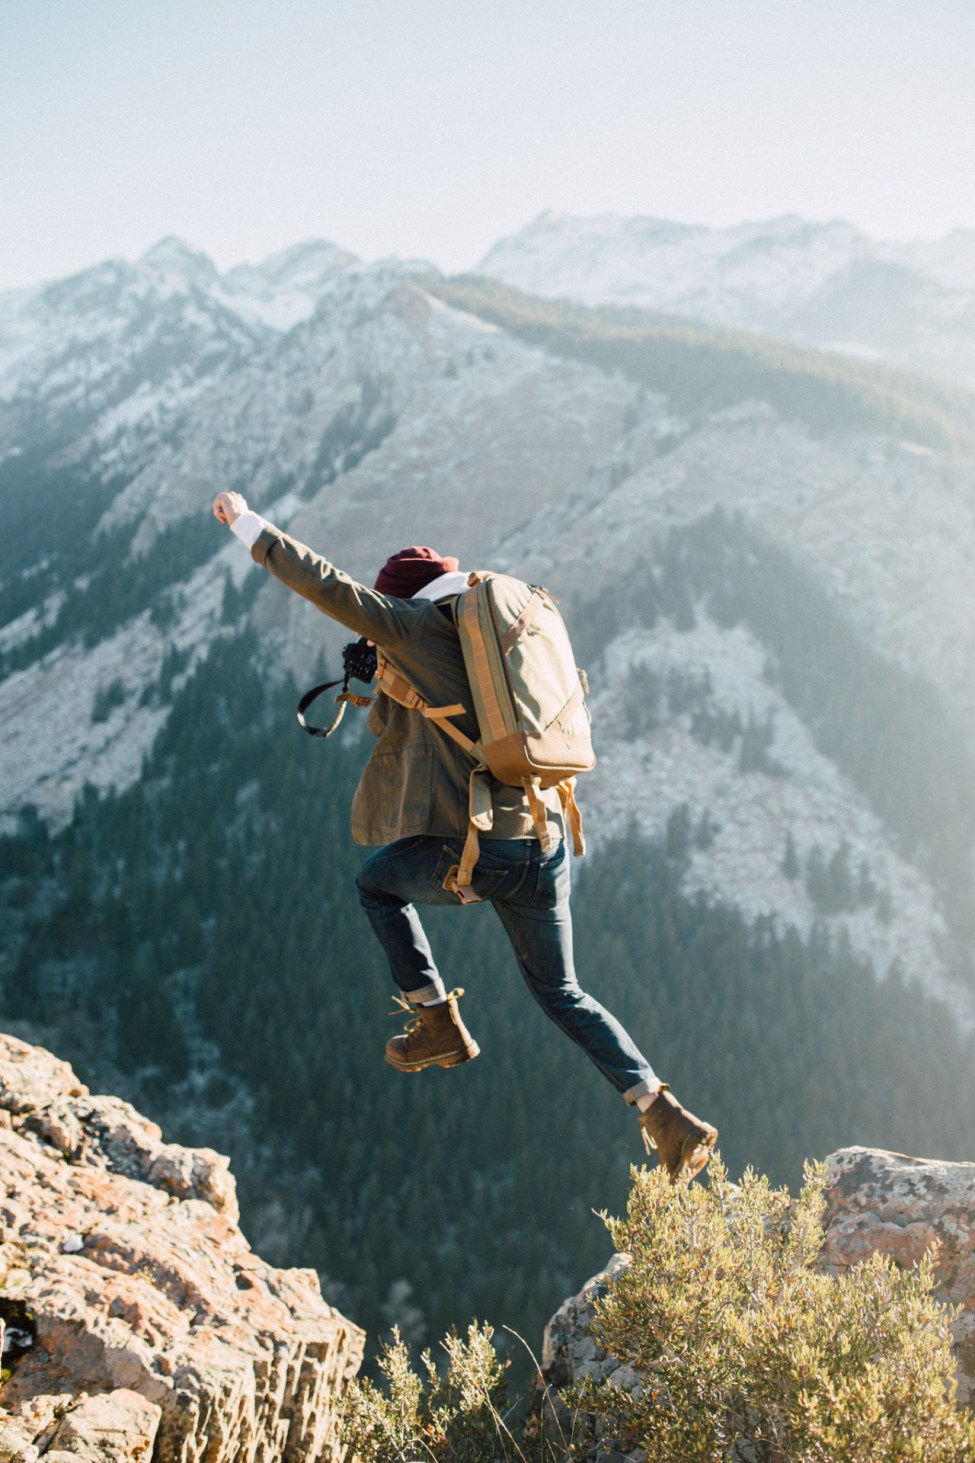 Jeune fille qui saute - Montagne